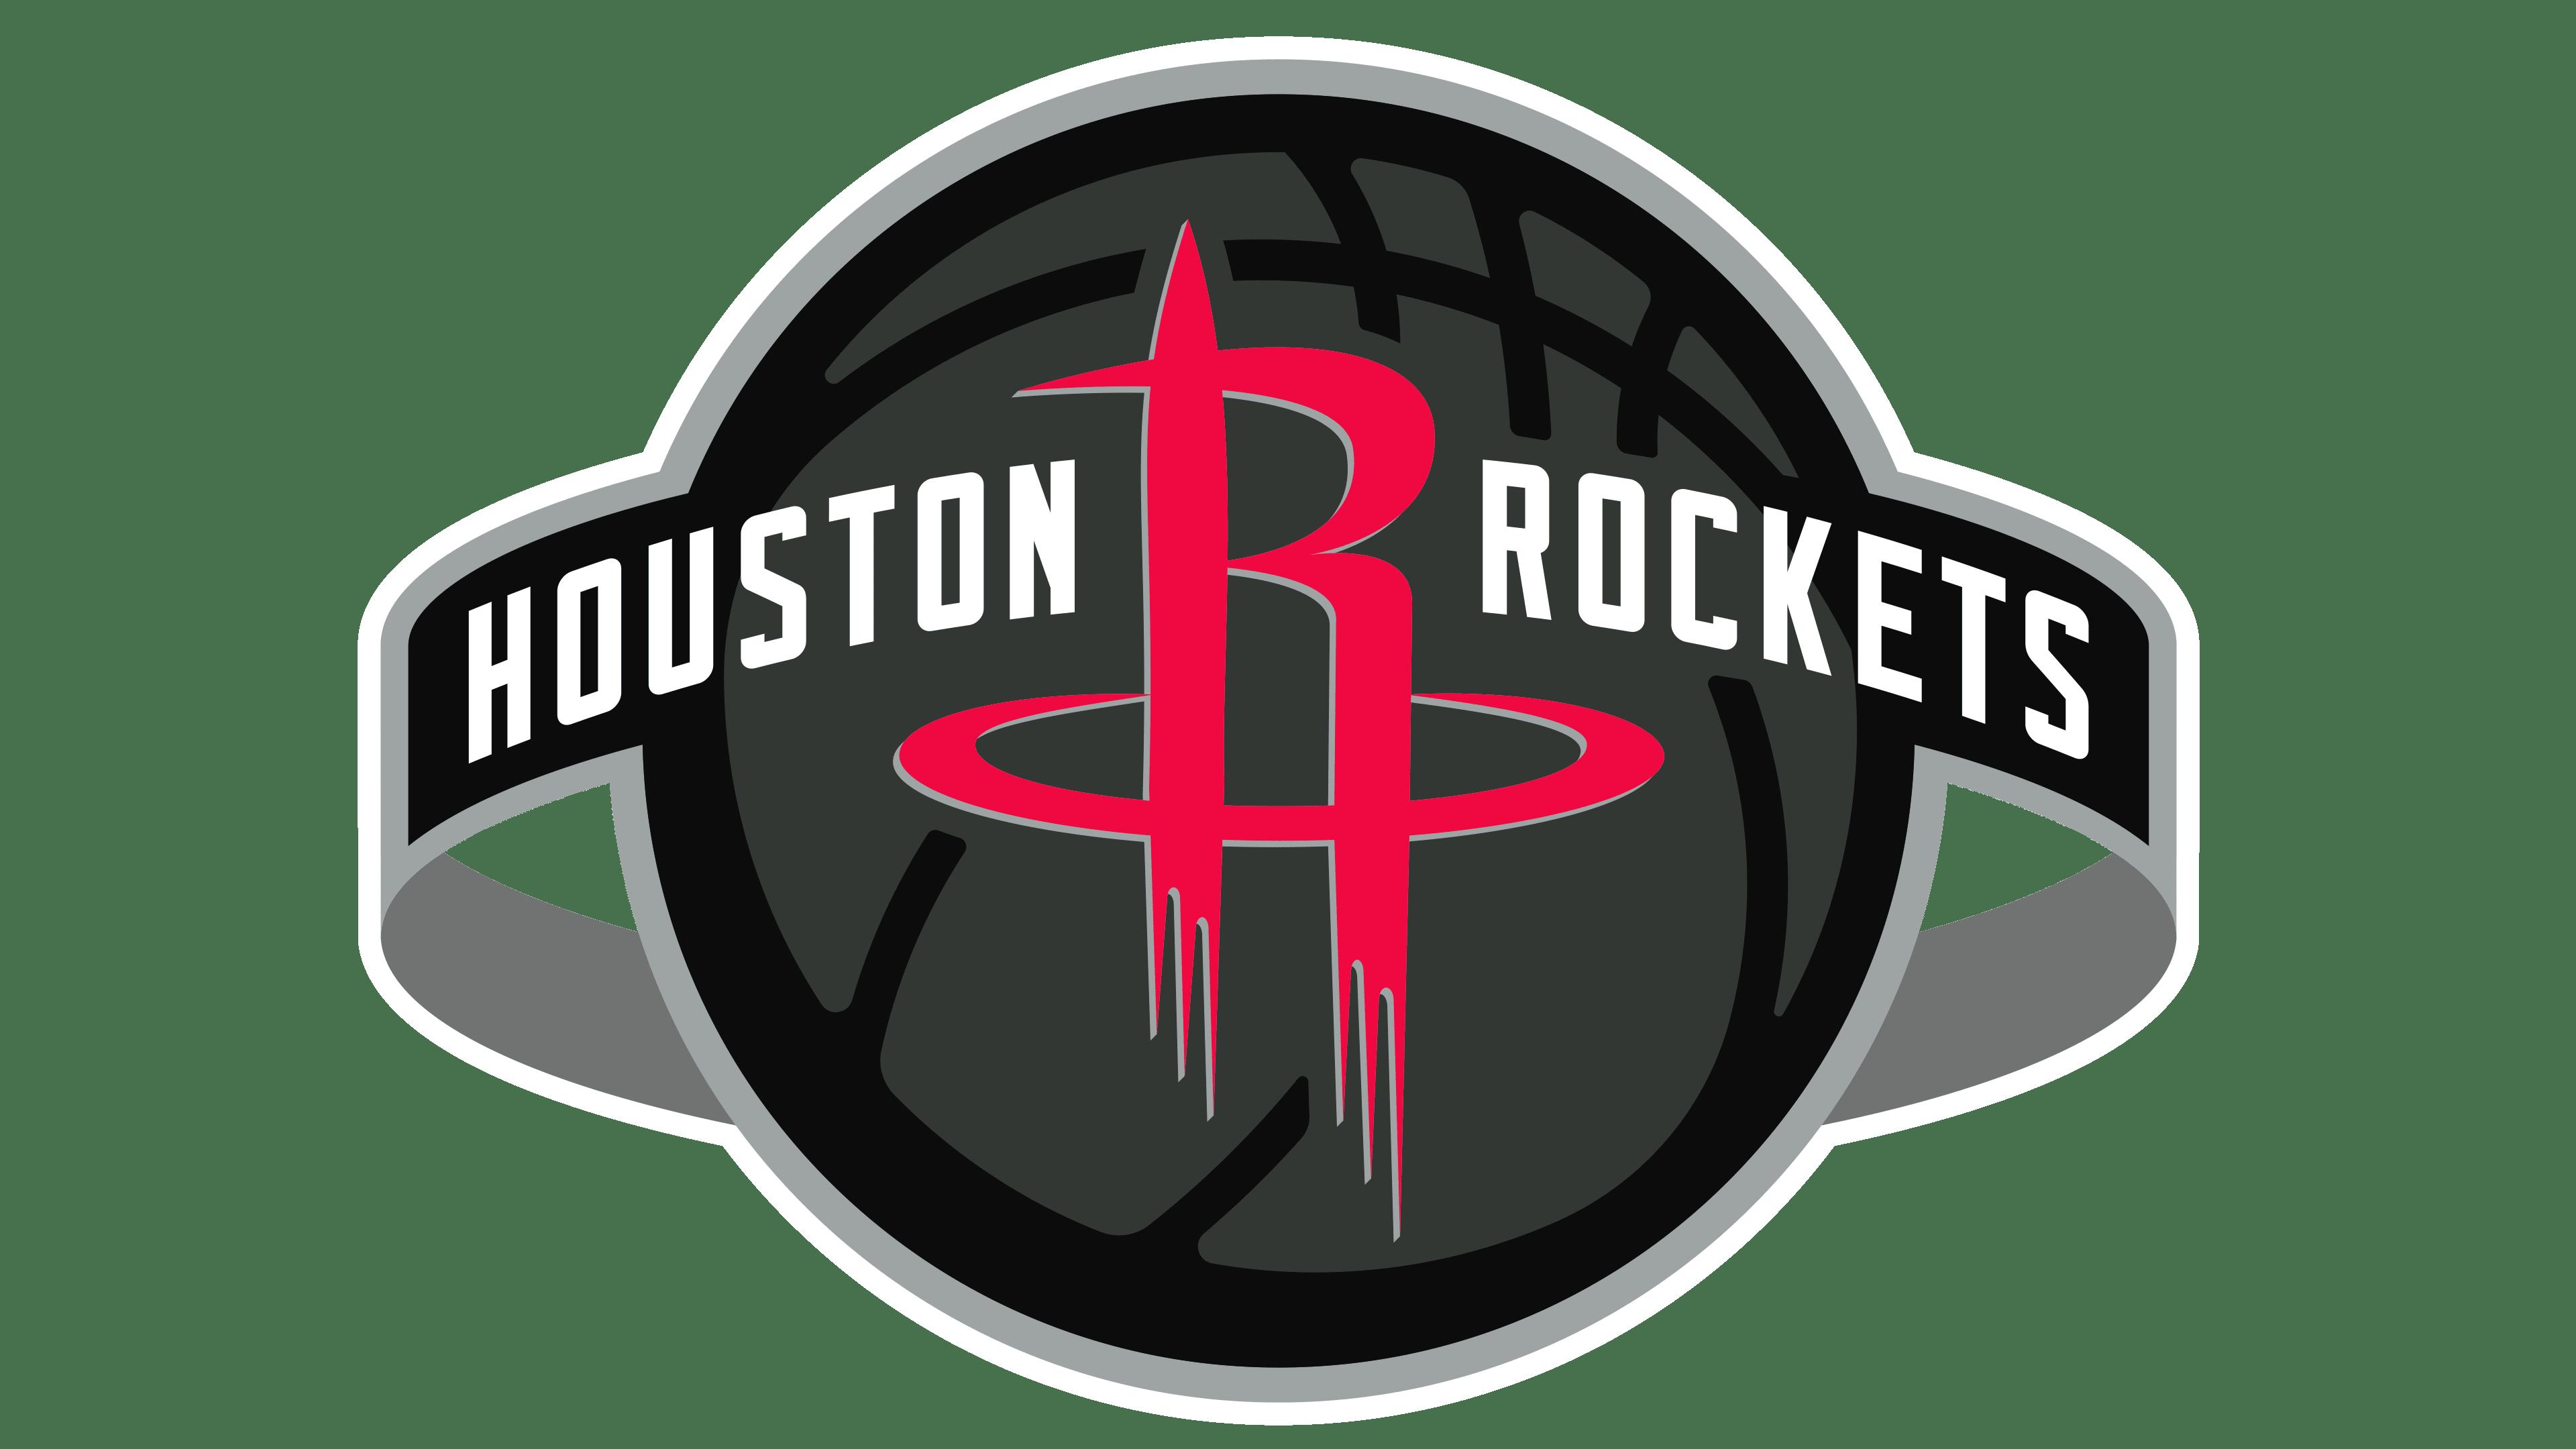 Houston Rockets – Wikipédia, a enciclopédia livre